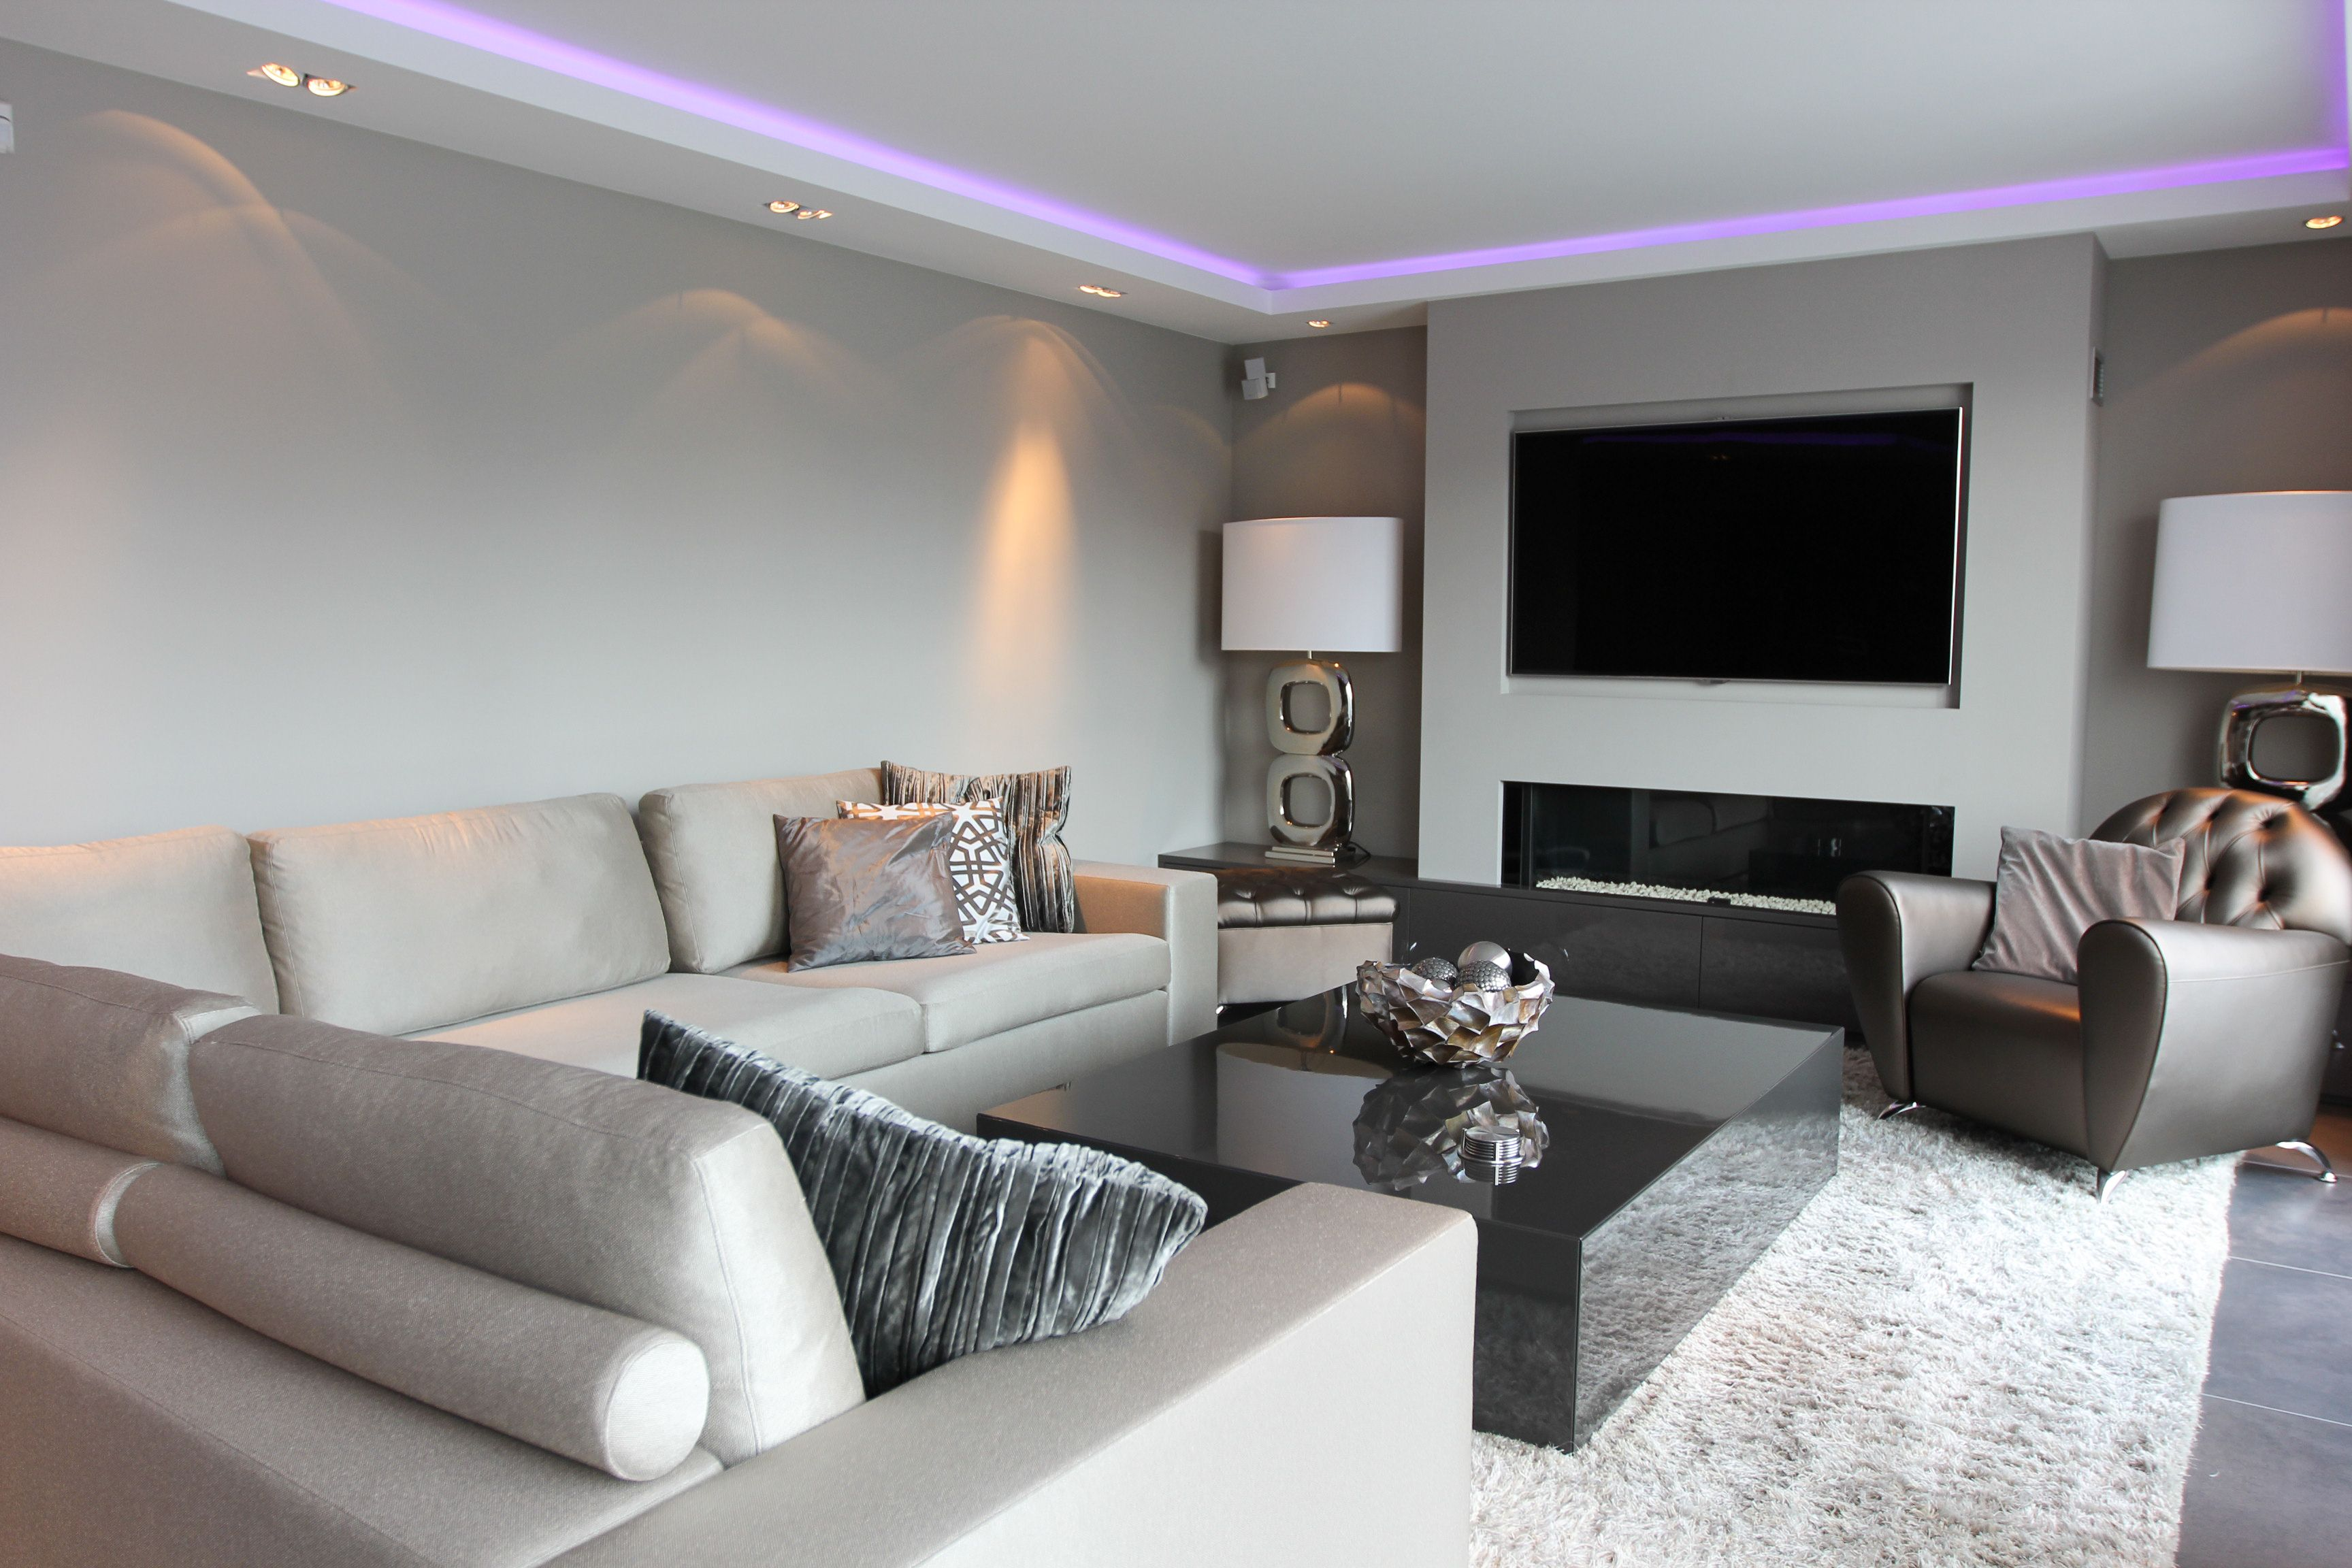 Living room design Joanne Schilder Joanne Schilder Design